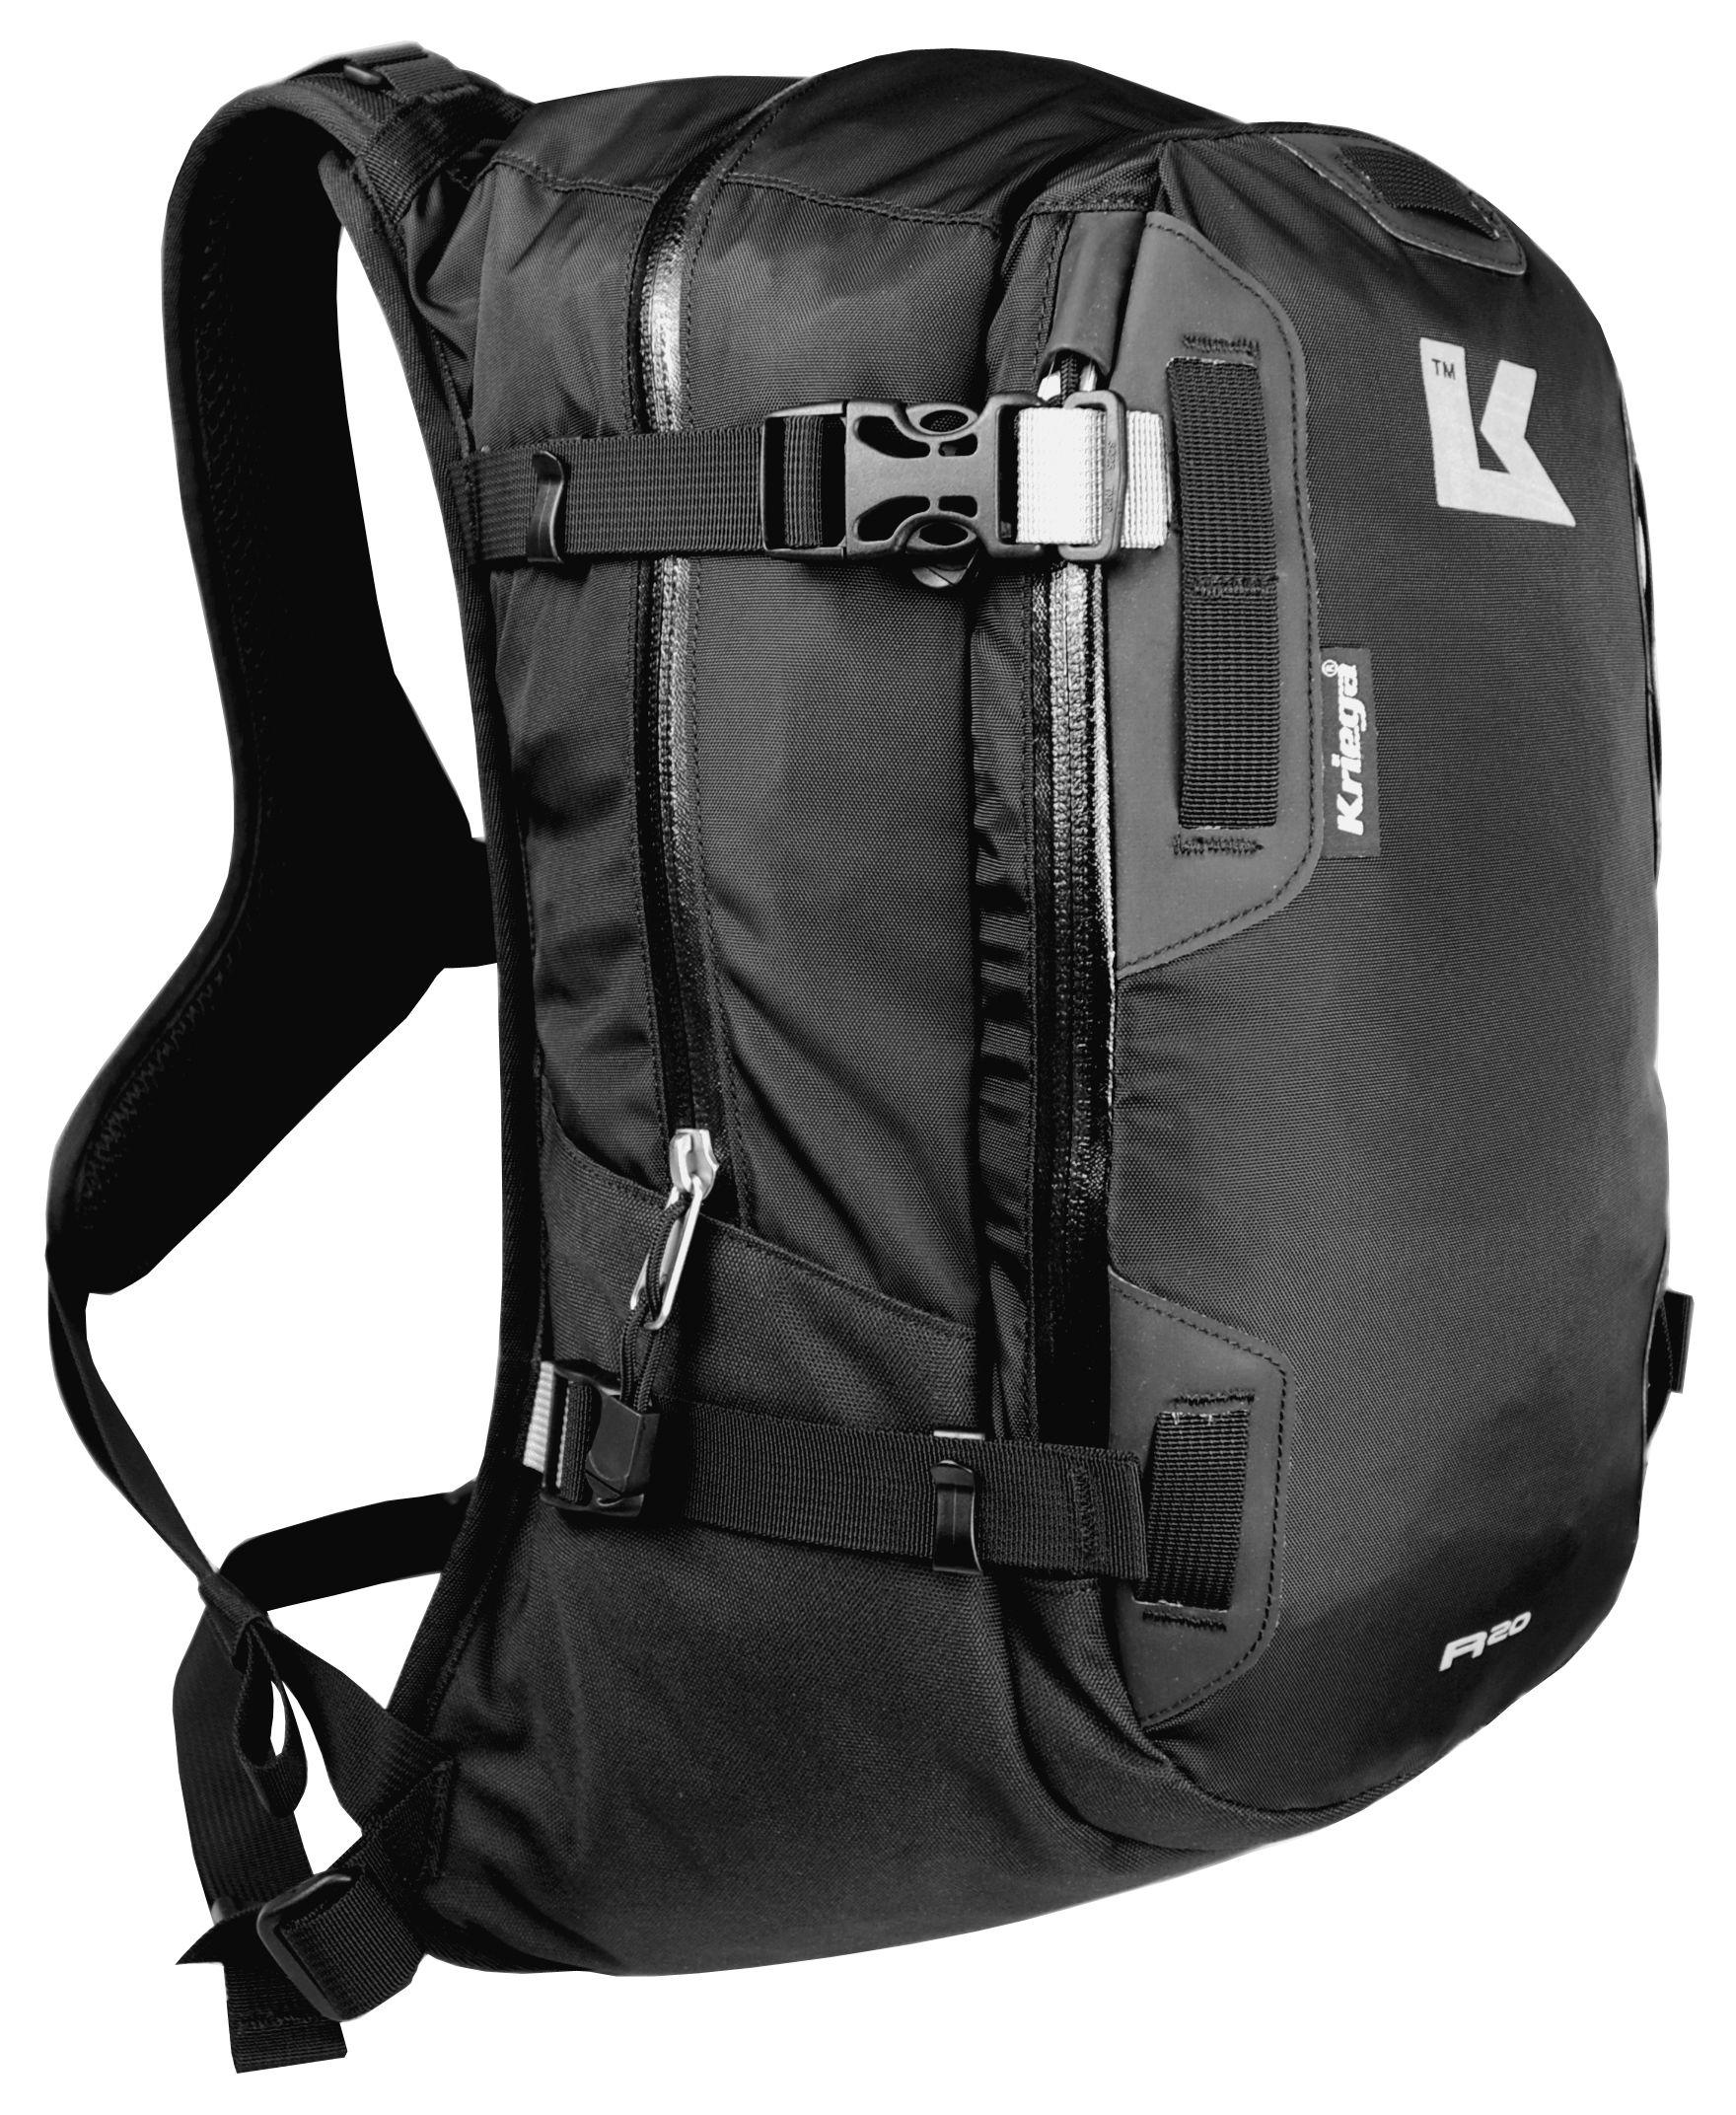 Kriega r25 моторюкзак купить выкройка модного рюкзака